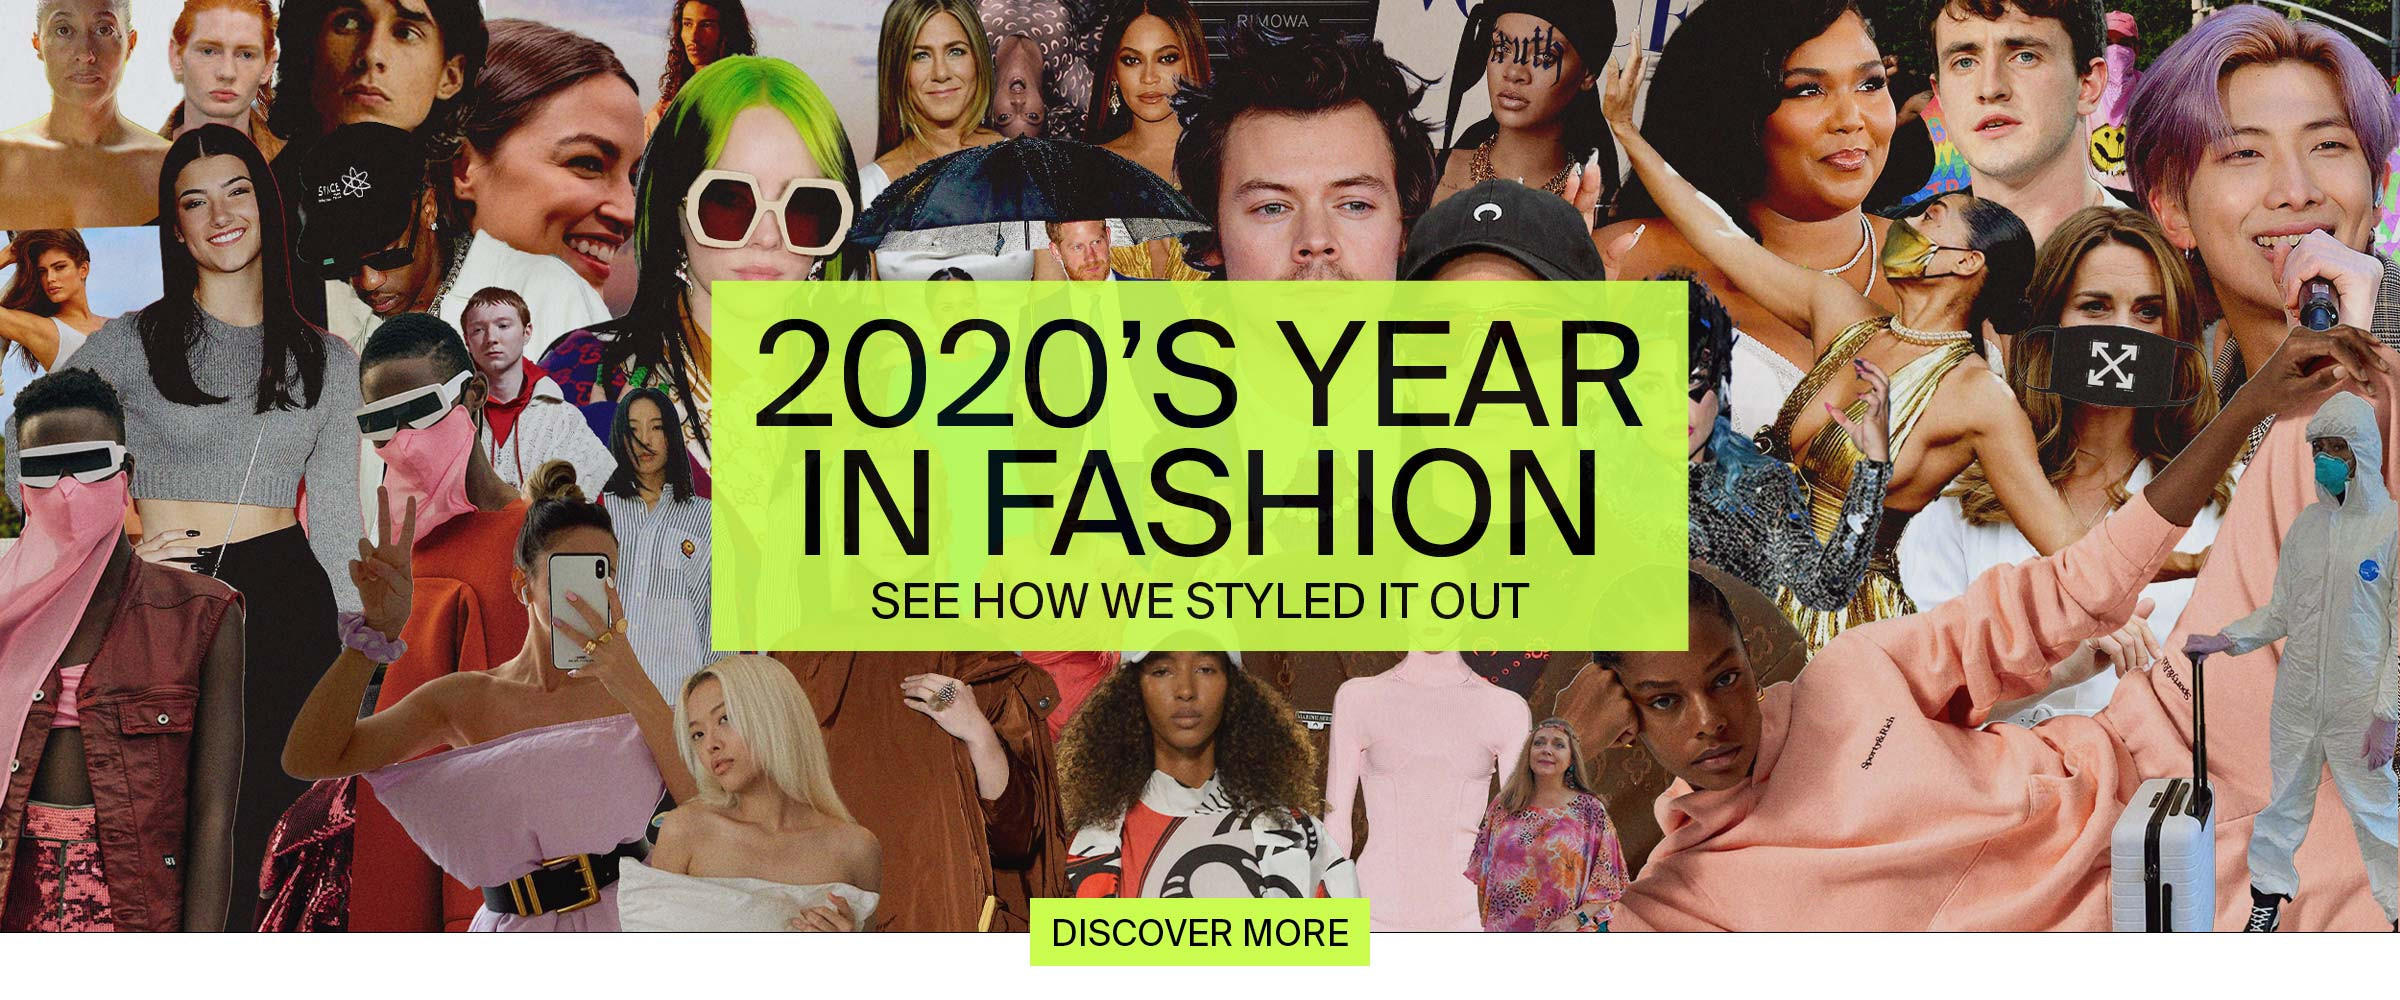 Year in Fashion 2020